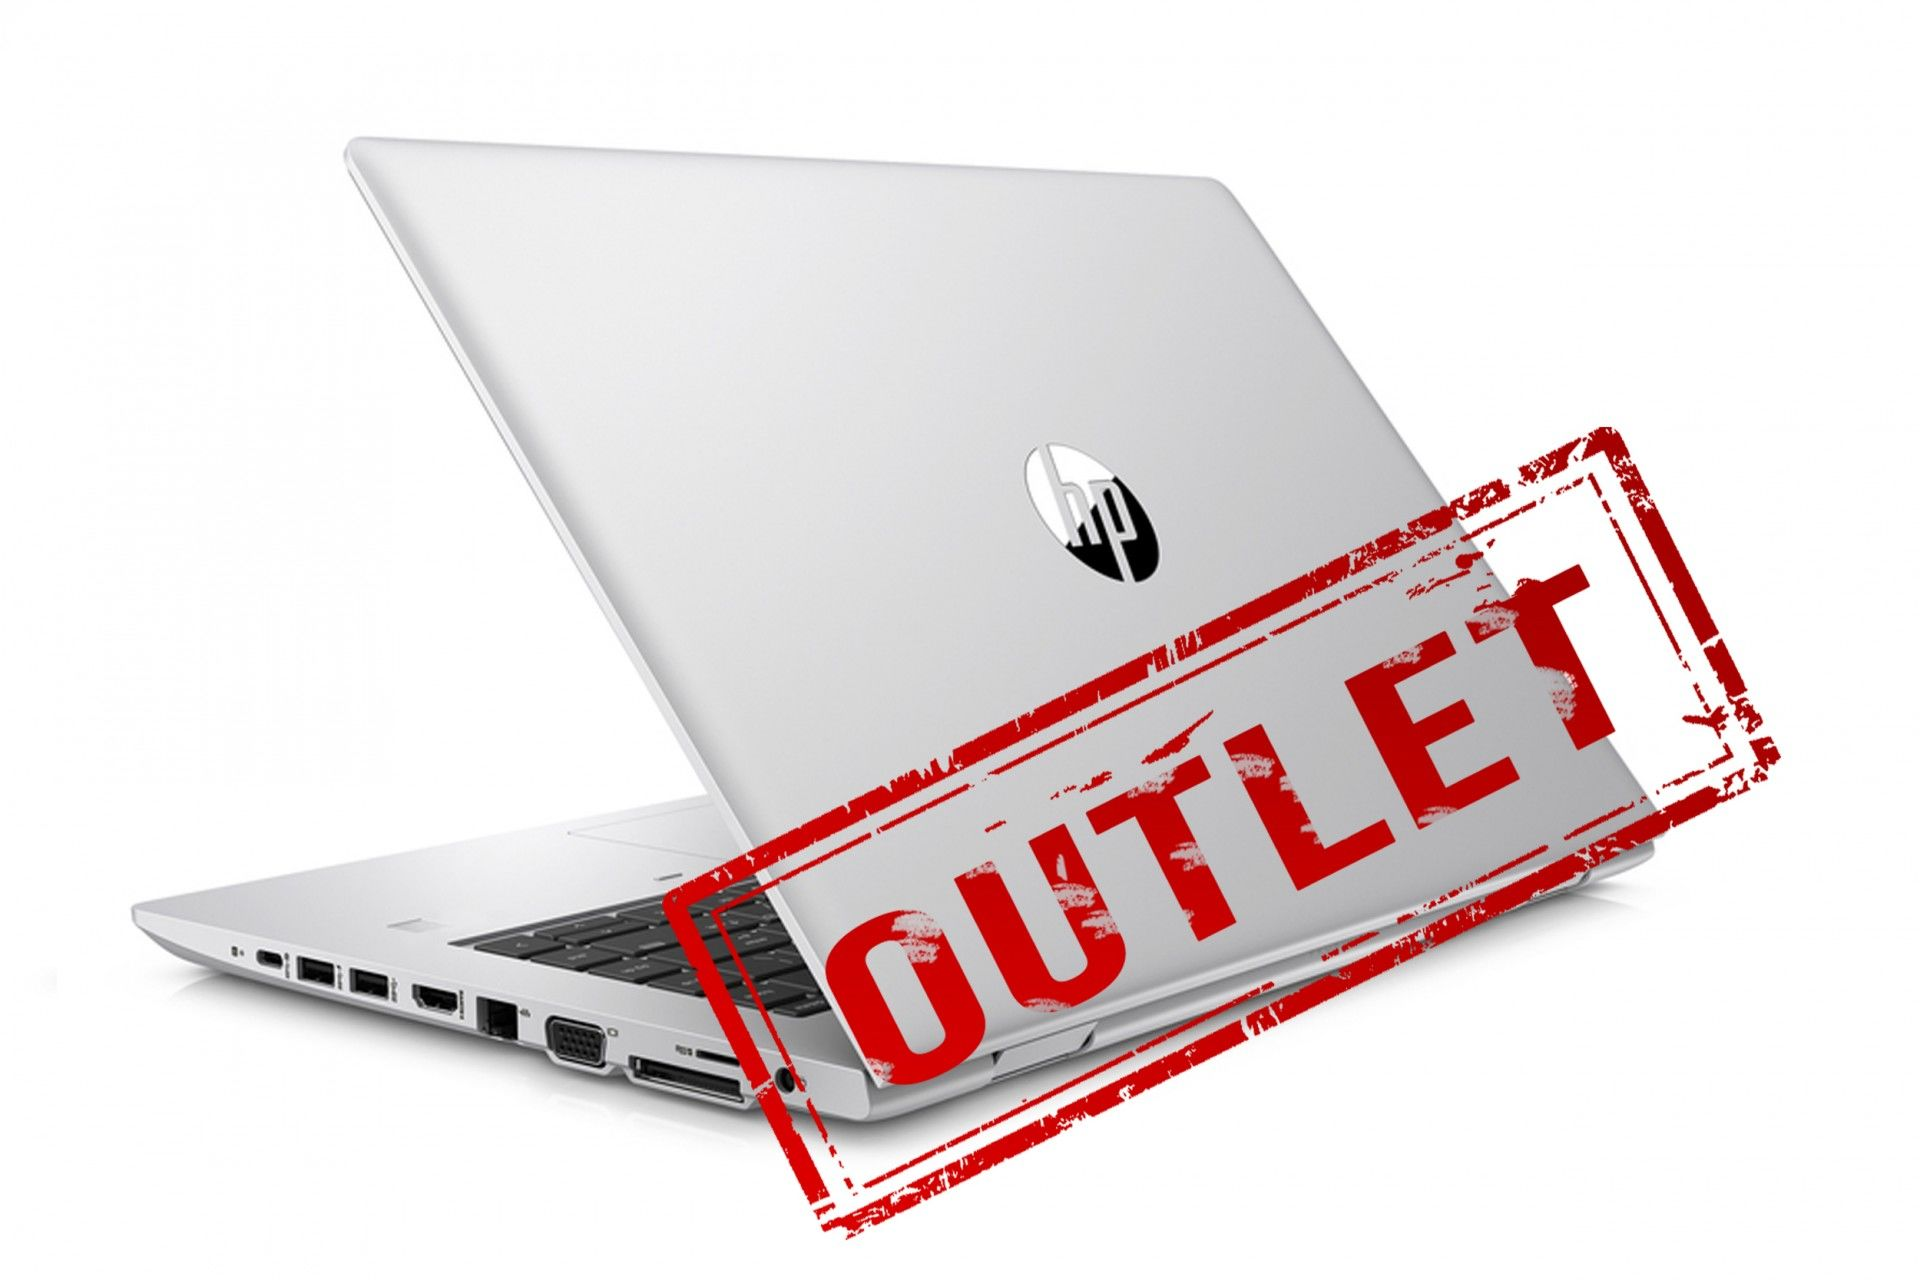 OUTLET Laptop HP ProBook 640 G5 7KP24EAR